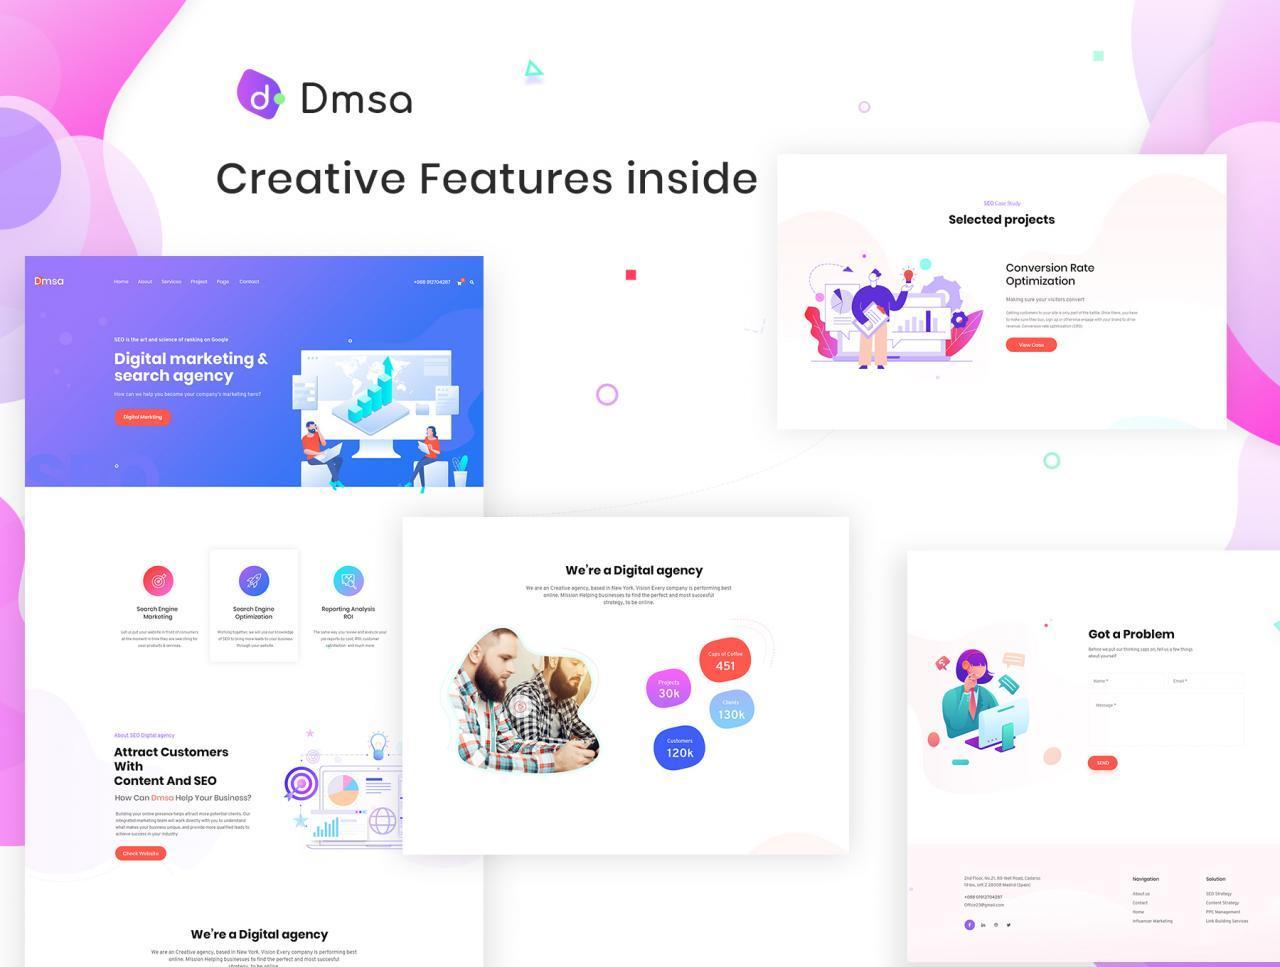 SEO优化WEB企业网站UI界面设计模板套件 Dmsa – SEO & Digital Agency Template插图(2)